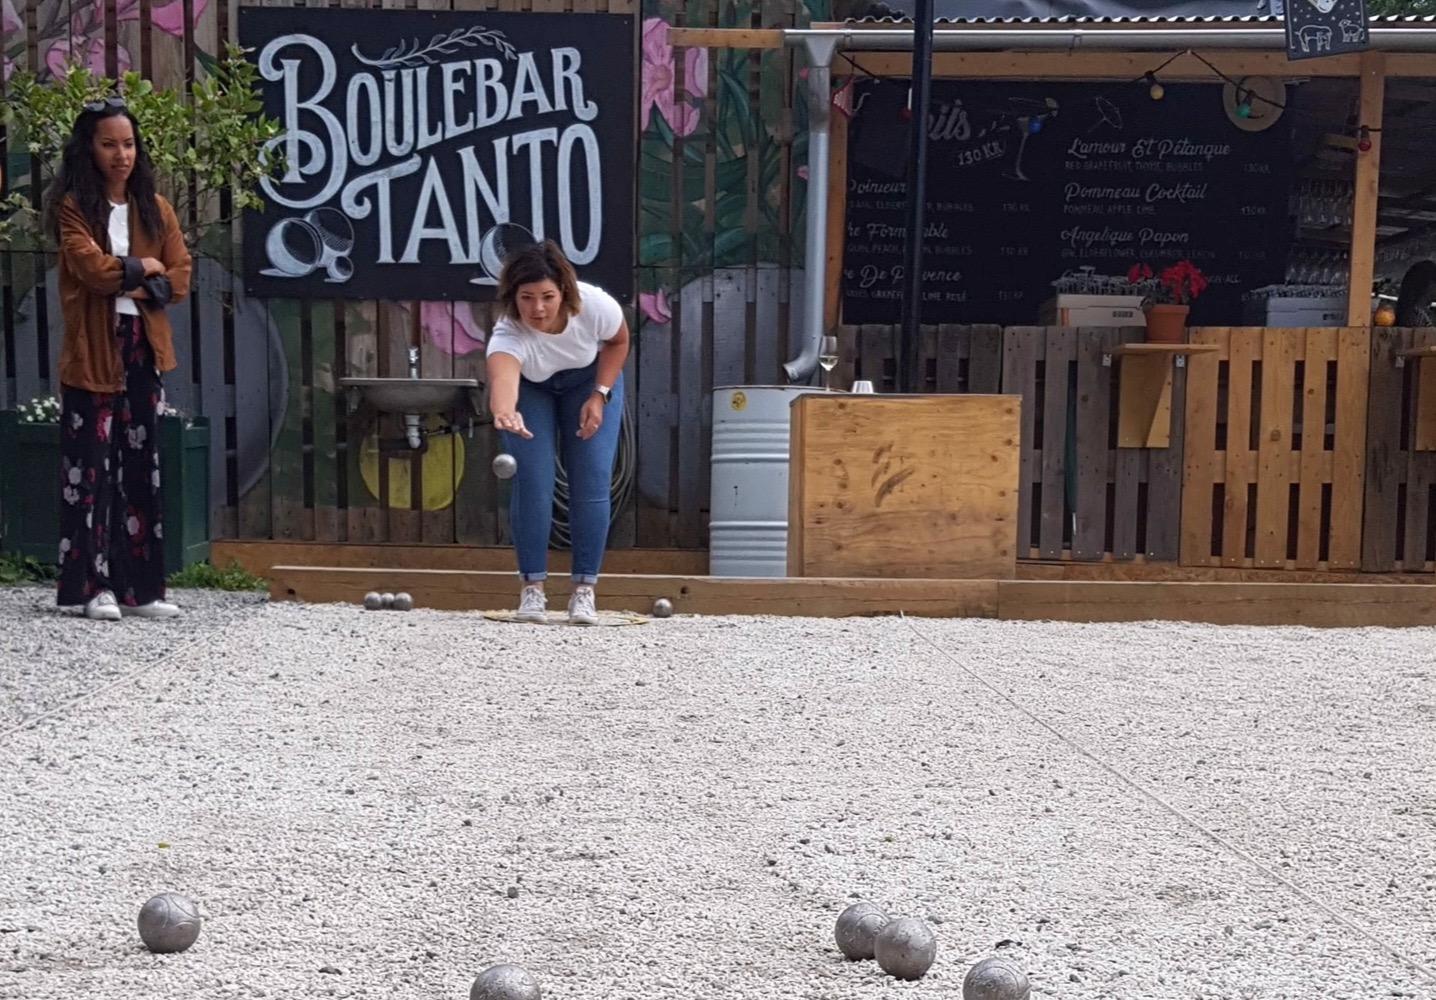 Boulebar Tanto - pétanque